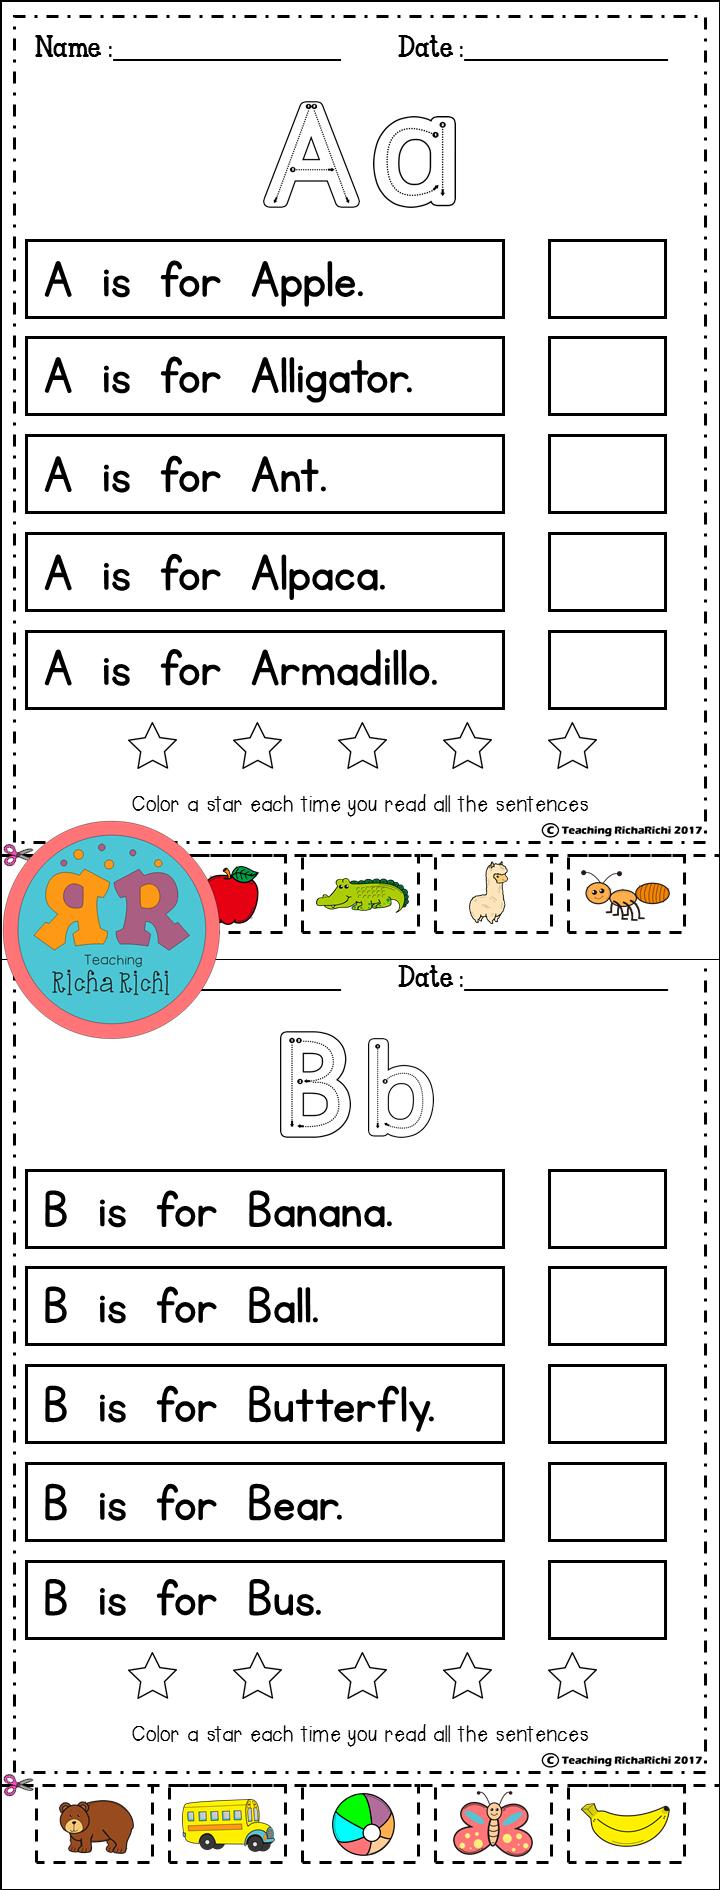 worksheet Pre K Sight Words Worksheets pin by teaching richarichi on products freebies free kindergarten activities pre k first grade 1st grade